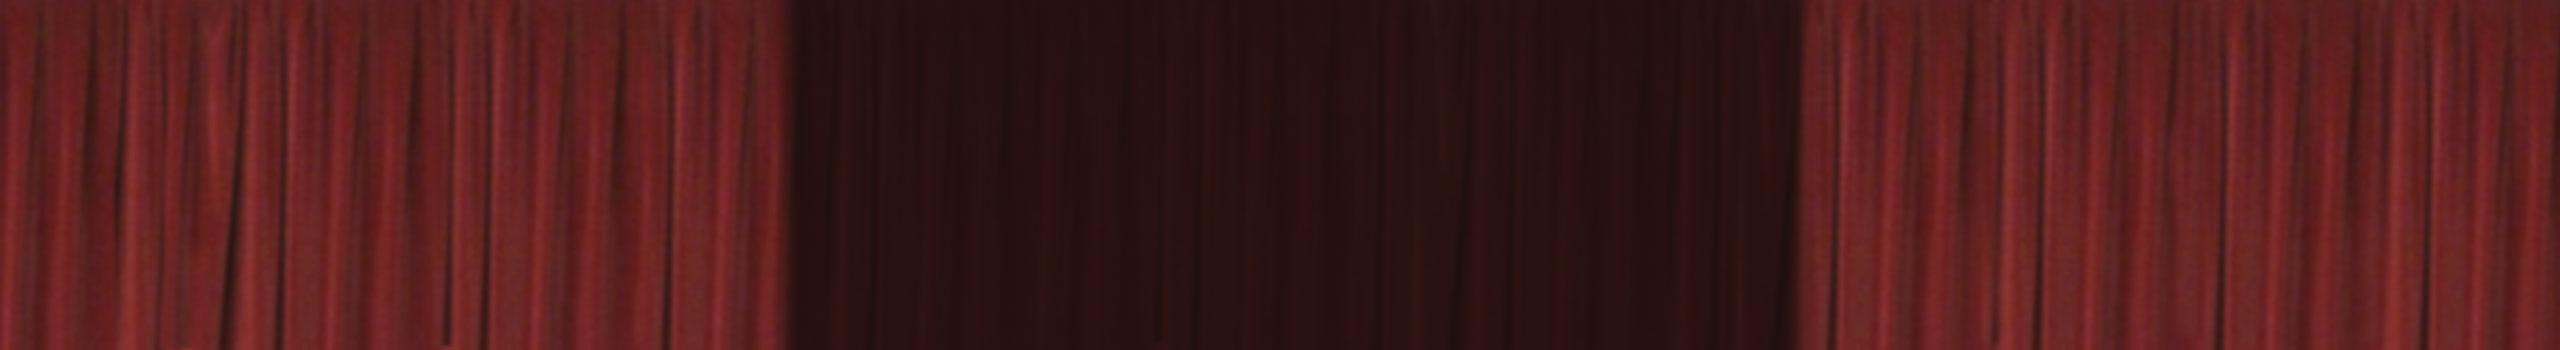 acteatrobilbao-slider-background-2560x3501